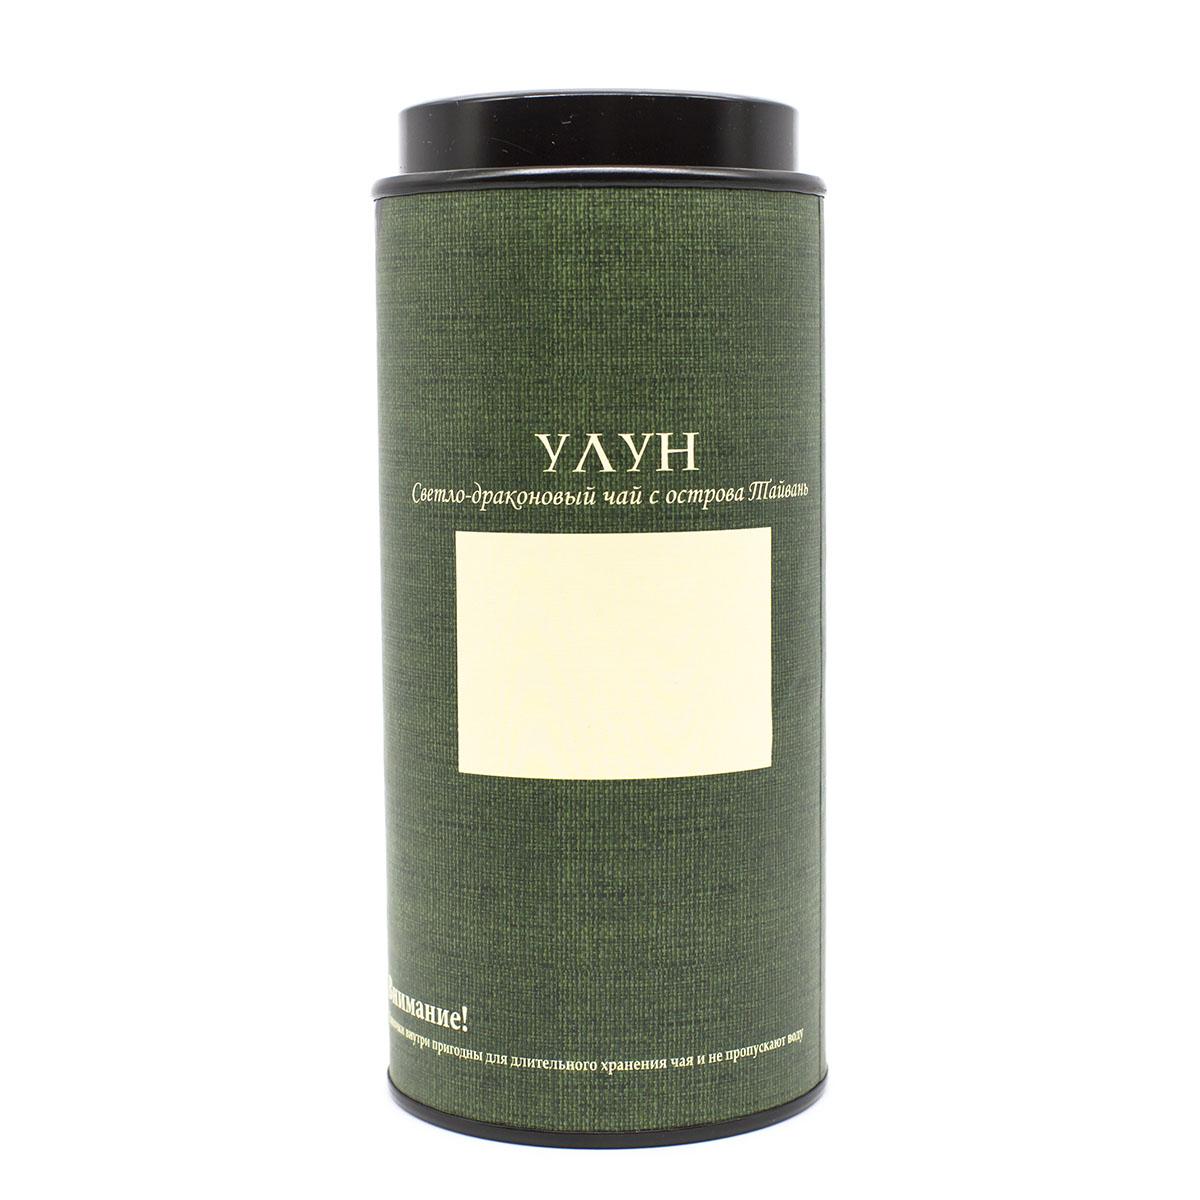 Банка картонная Мелодия неба - Улун тайваньский 76*145 maitre de the женьшень улун зеленый листовой чай 150 г жестяная банка